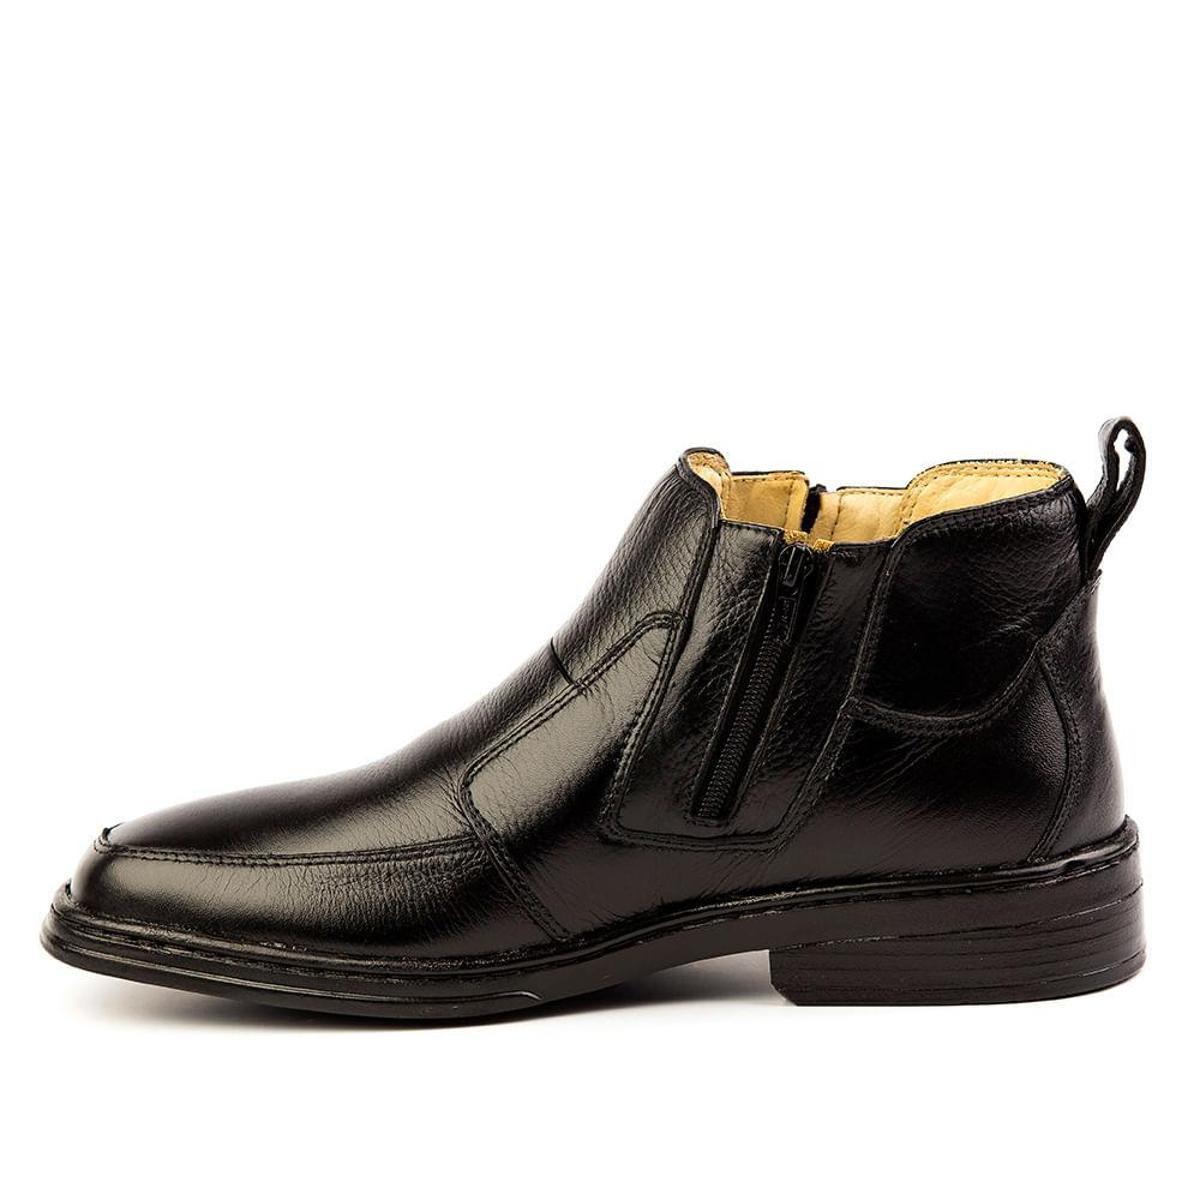 Botina Masculino 916 em Couro Floater Doctor Shoes - Preto